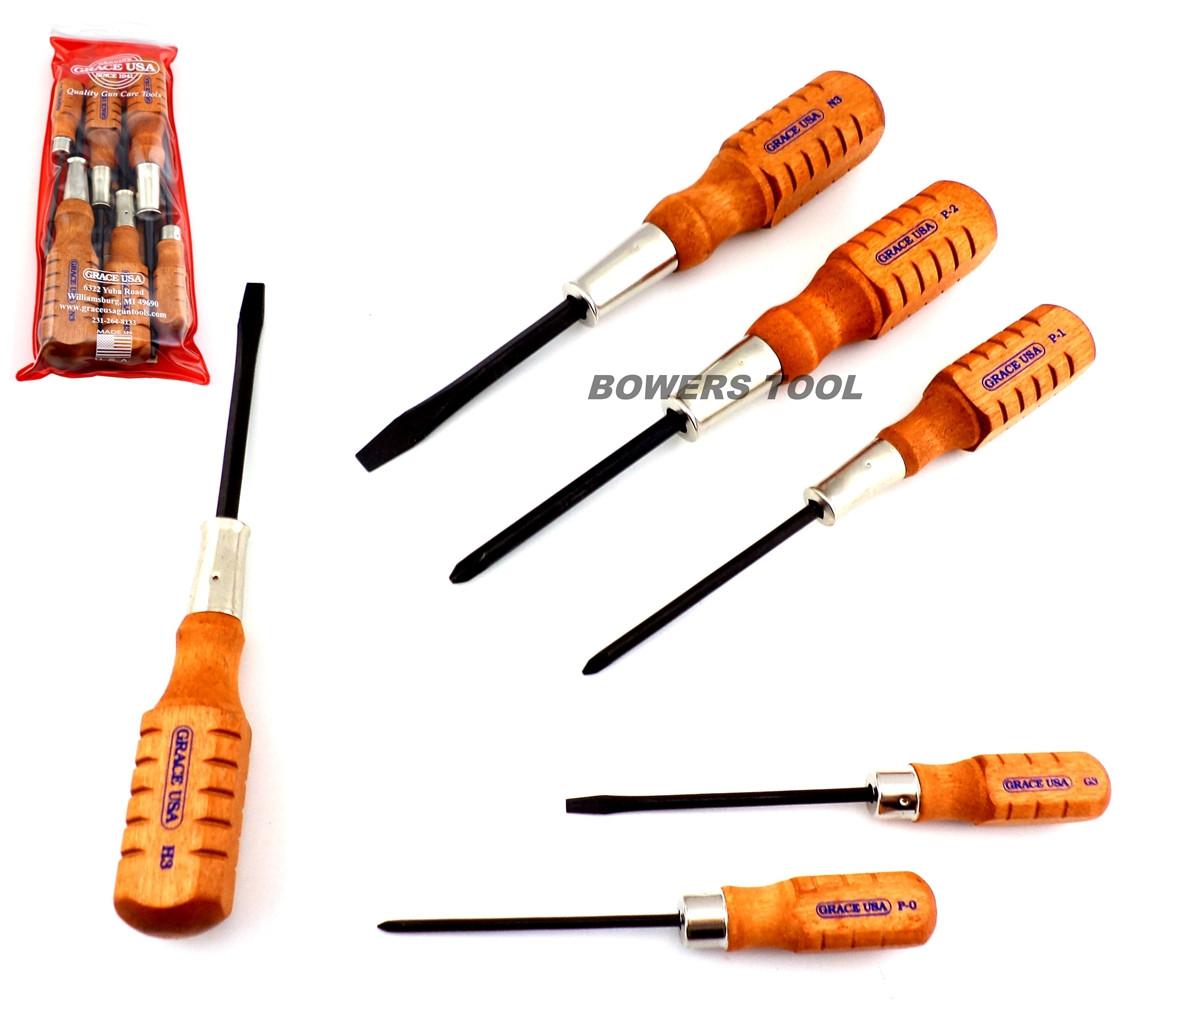 grace usa 6pc home care wood handle screwdriver set made in usa. Black Bedroom Furniture Sets. Home Design Ideas